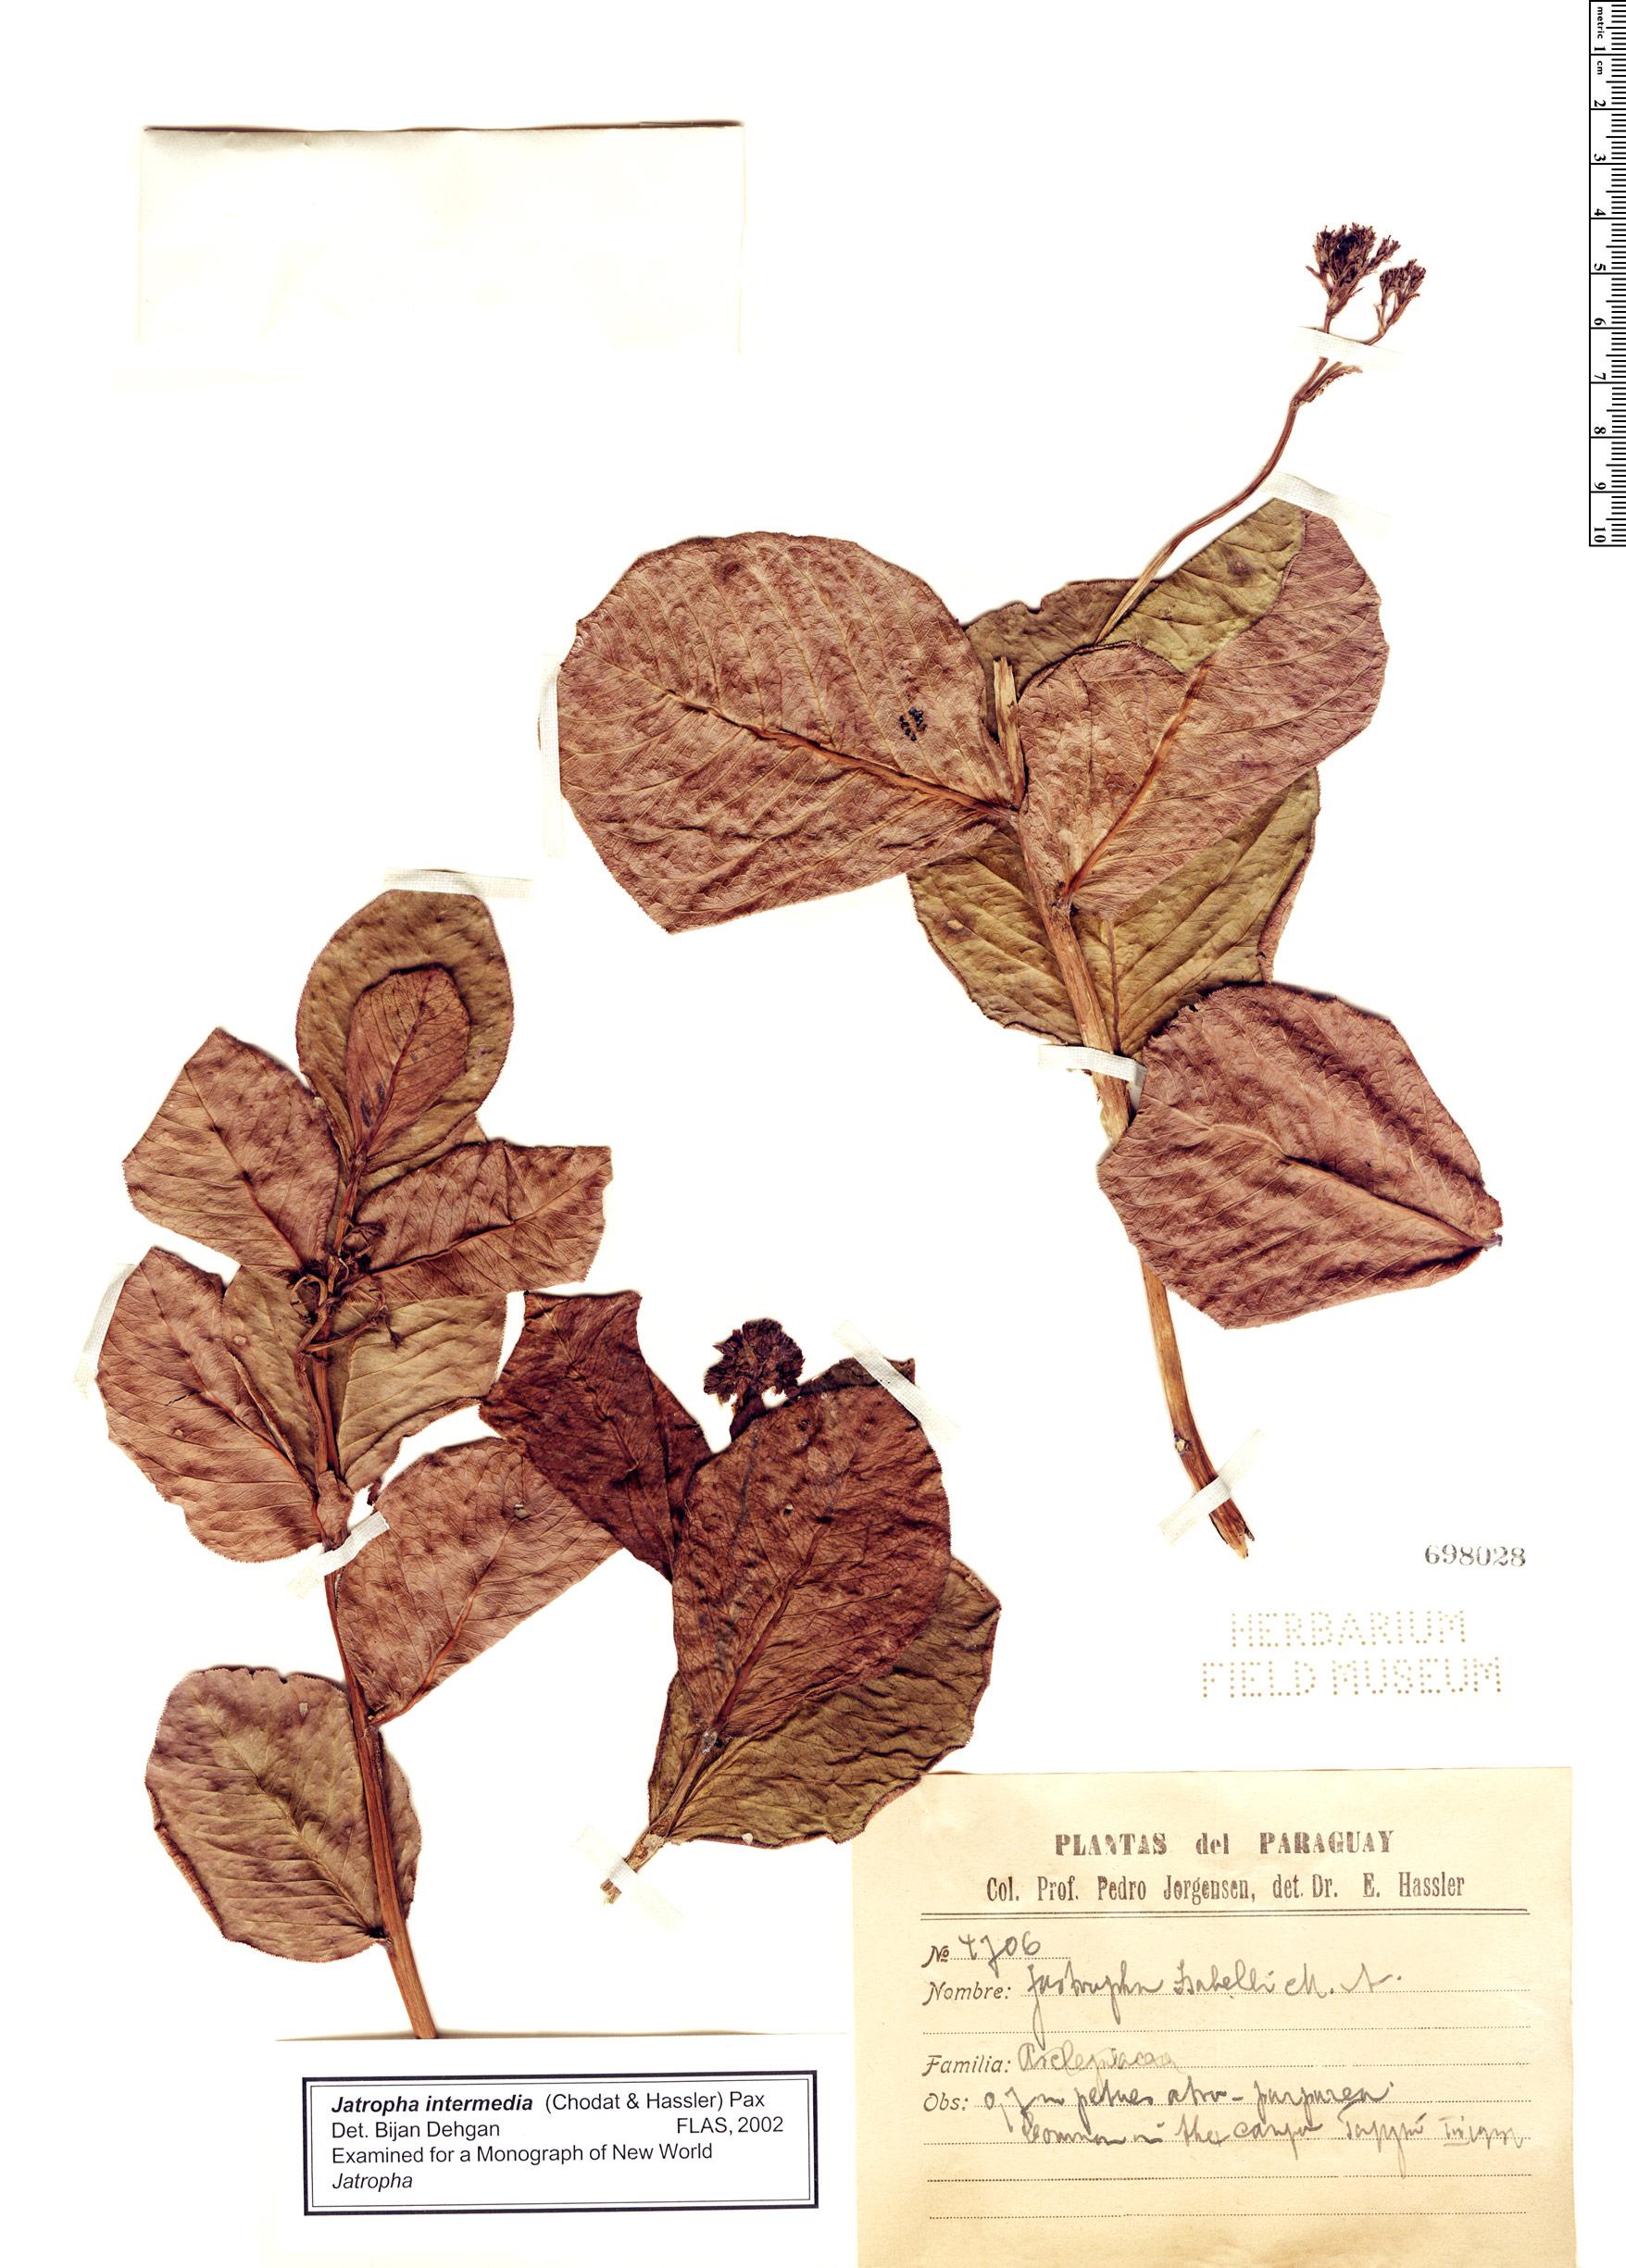 Specimen: Jatropha intermedia